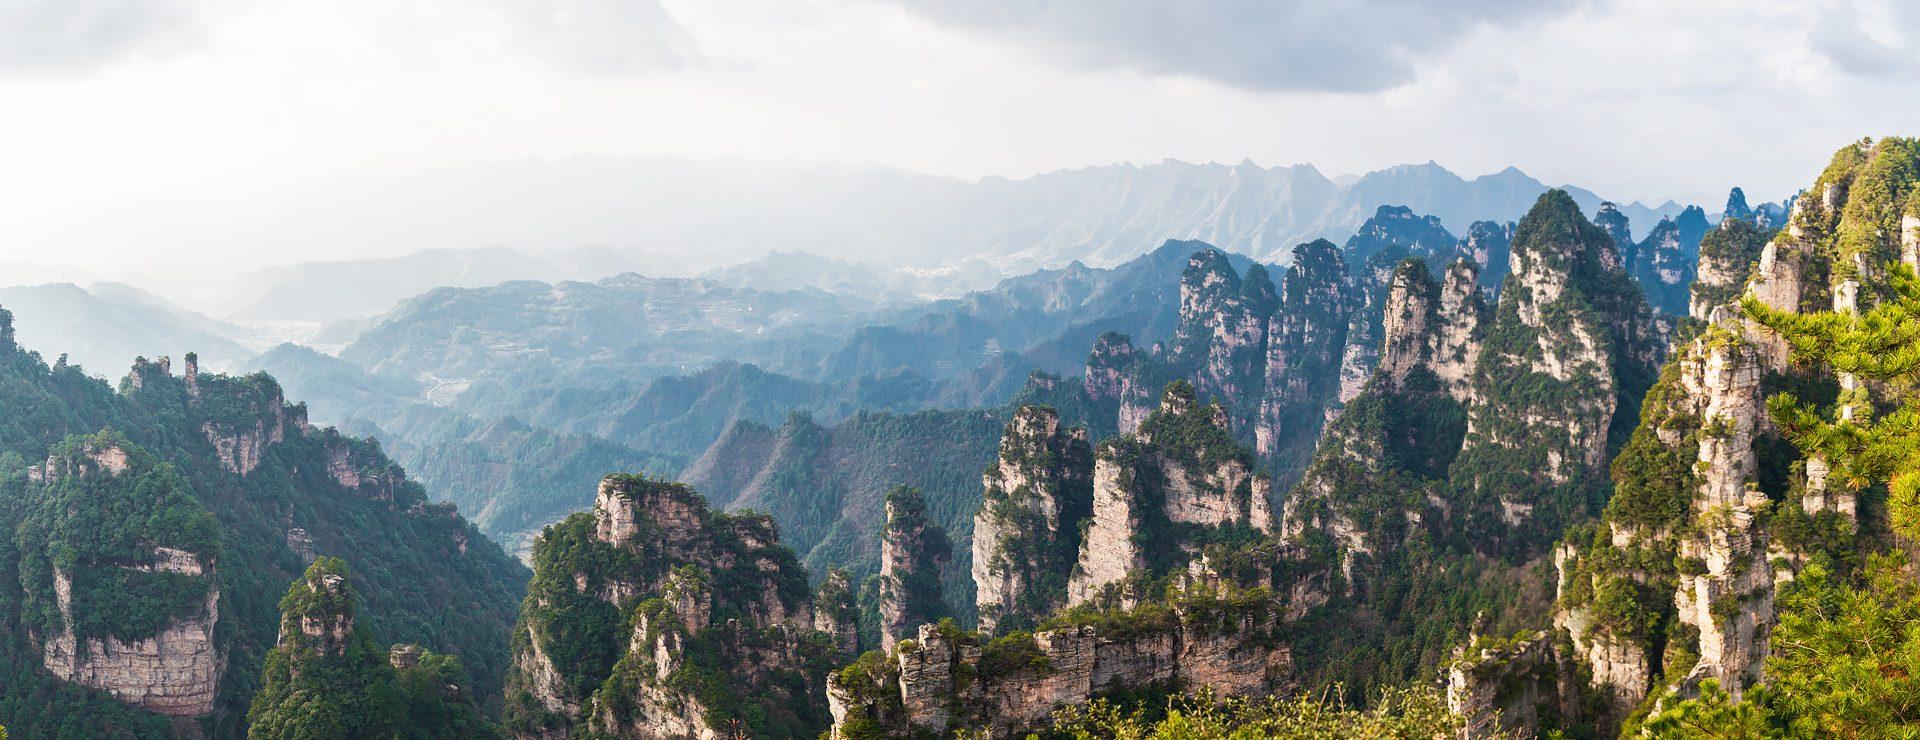 Wulingyuan naturområde